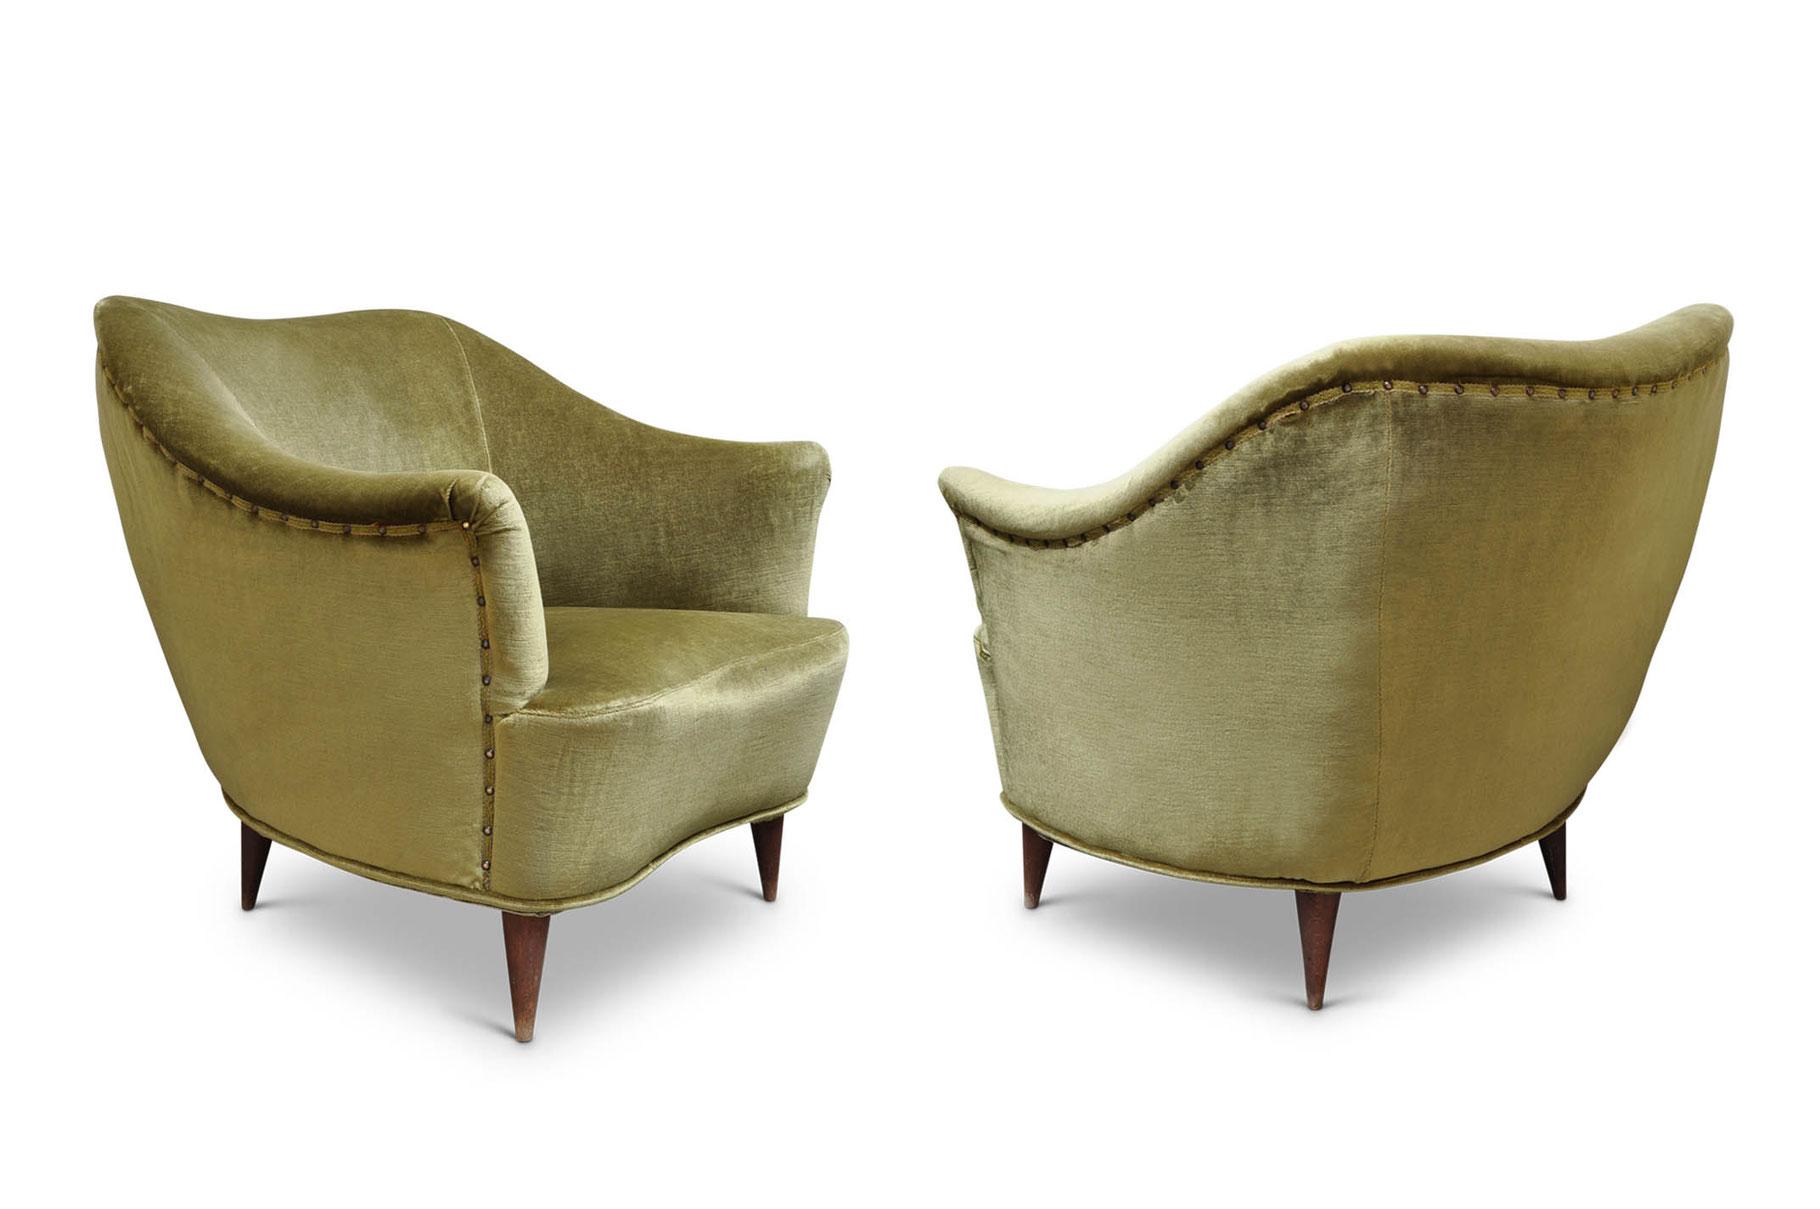 Poltrone gio ponti casa e giardino italian vintage sofa for Poltrone giardino